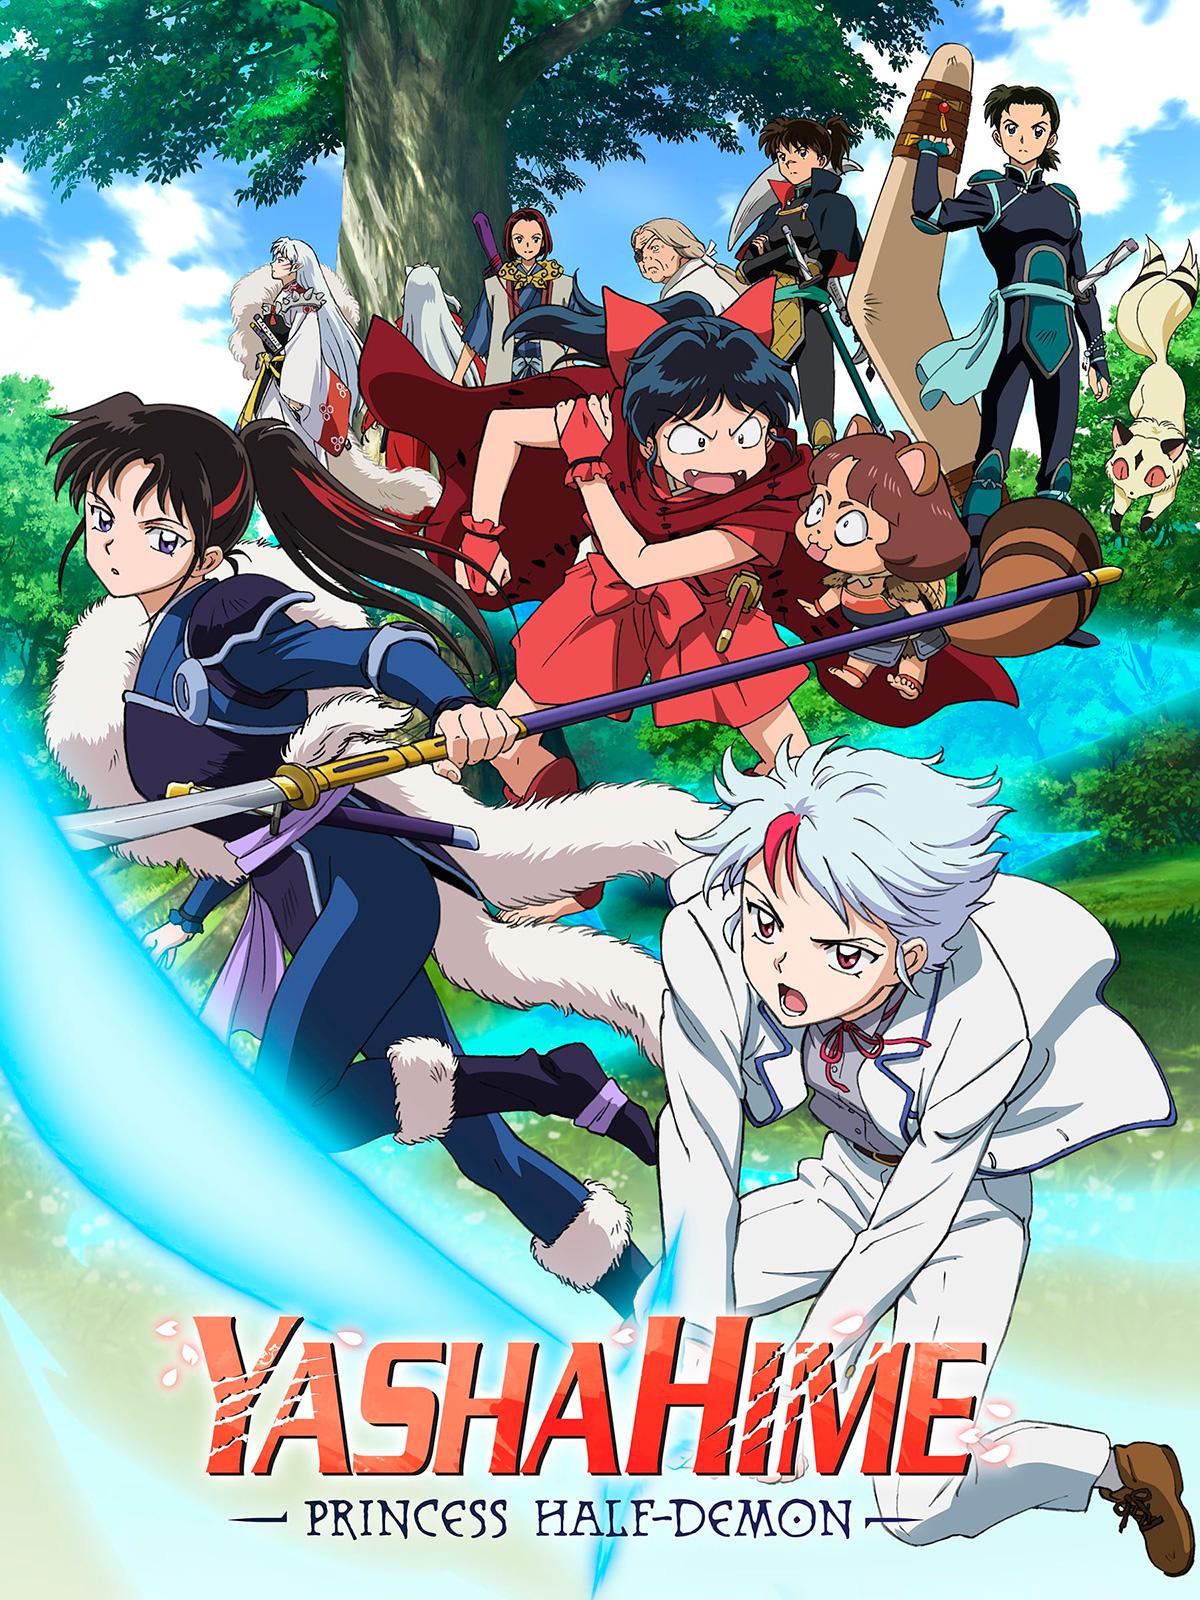 Yashahime : Princess Half-Demon